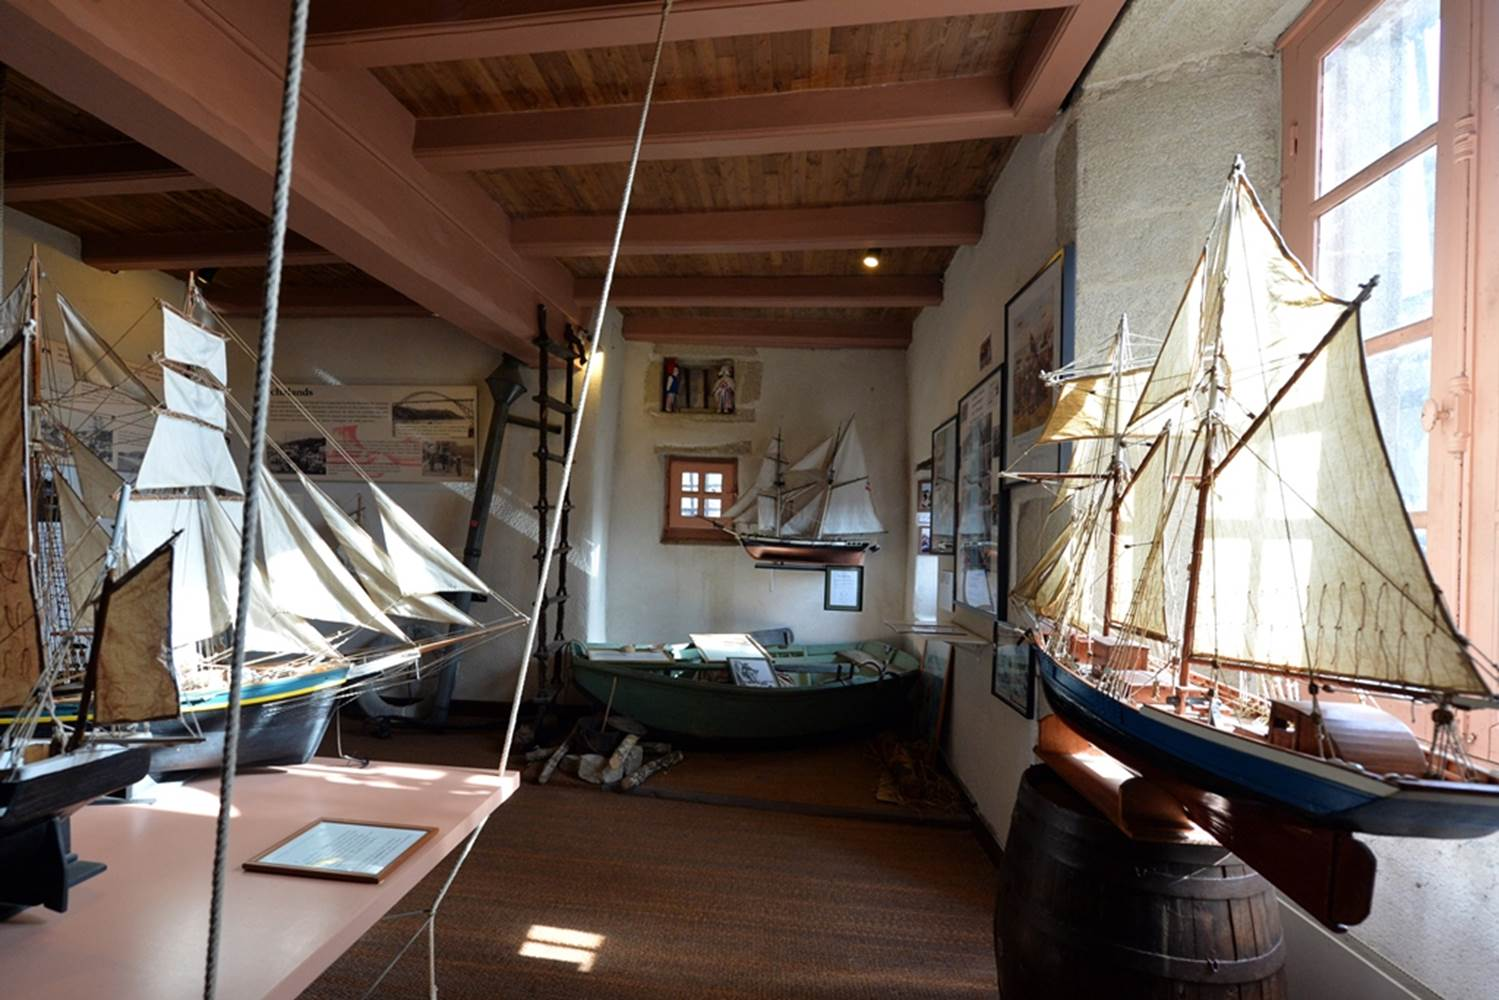 Musée de la Vilaine Maritime La Roche Bernard Morbihan Bretagne Sud © ©M.Renac-Morbihan.com.